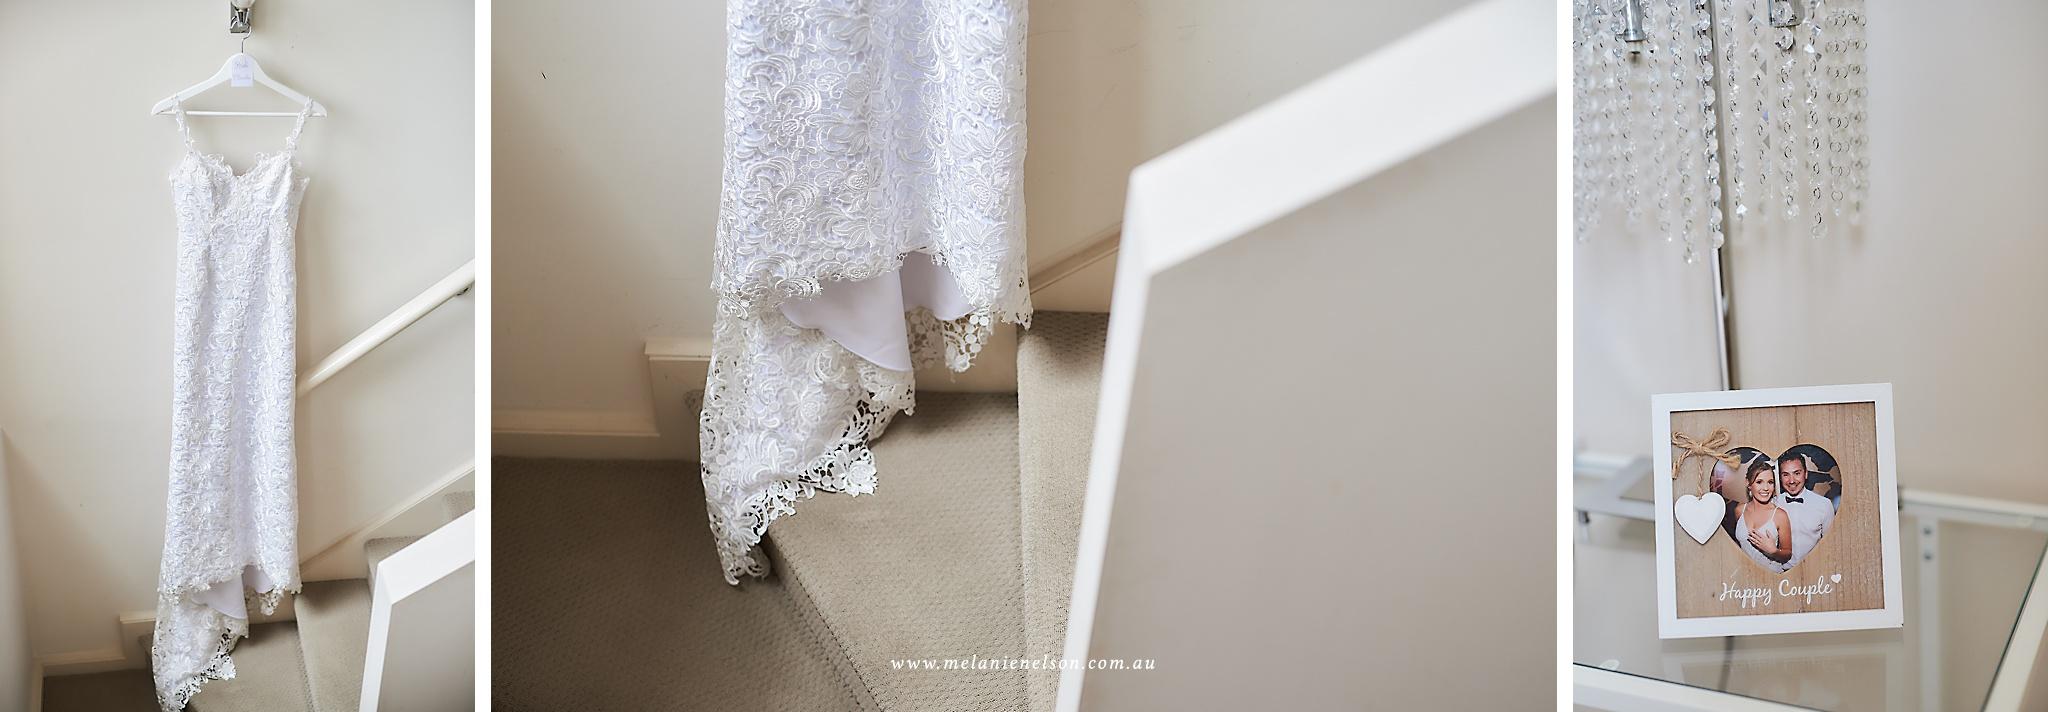 serafino_wedding_photography_0009.jpg